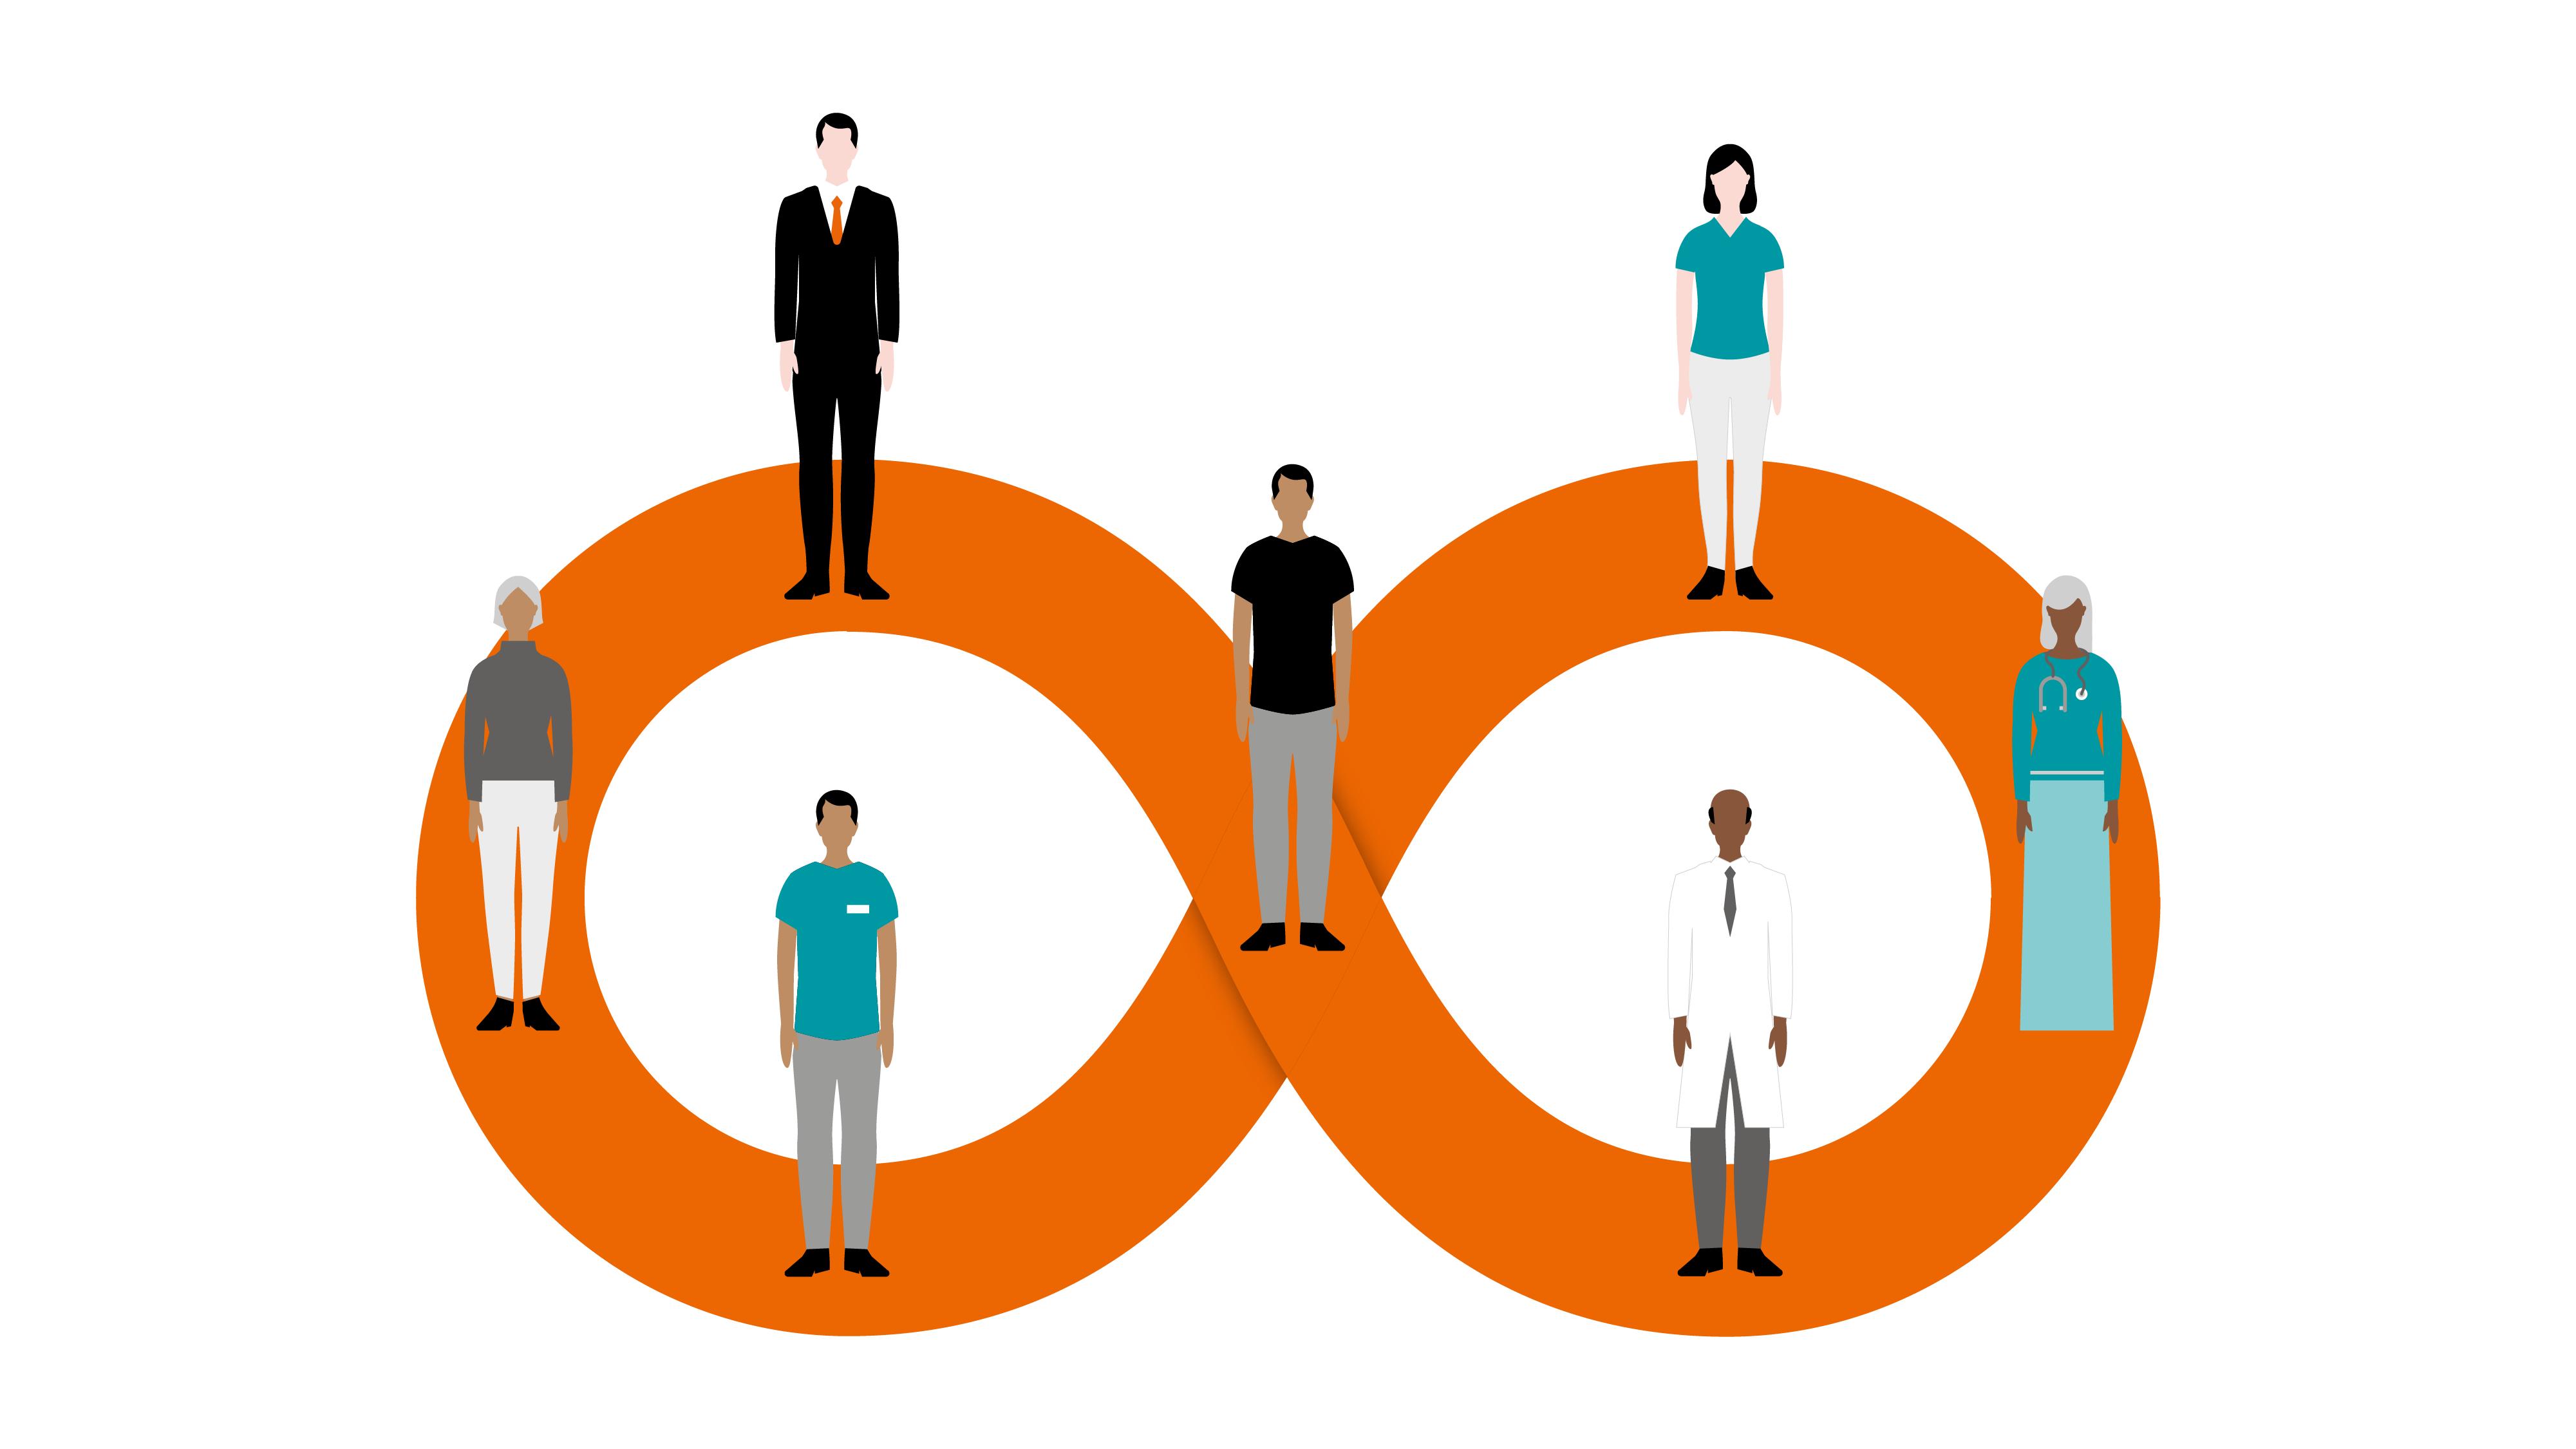 Siemens Healthineers - Partnership Models: Adding value, Enabling Innovation